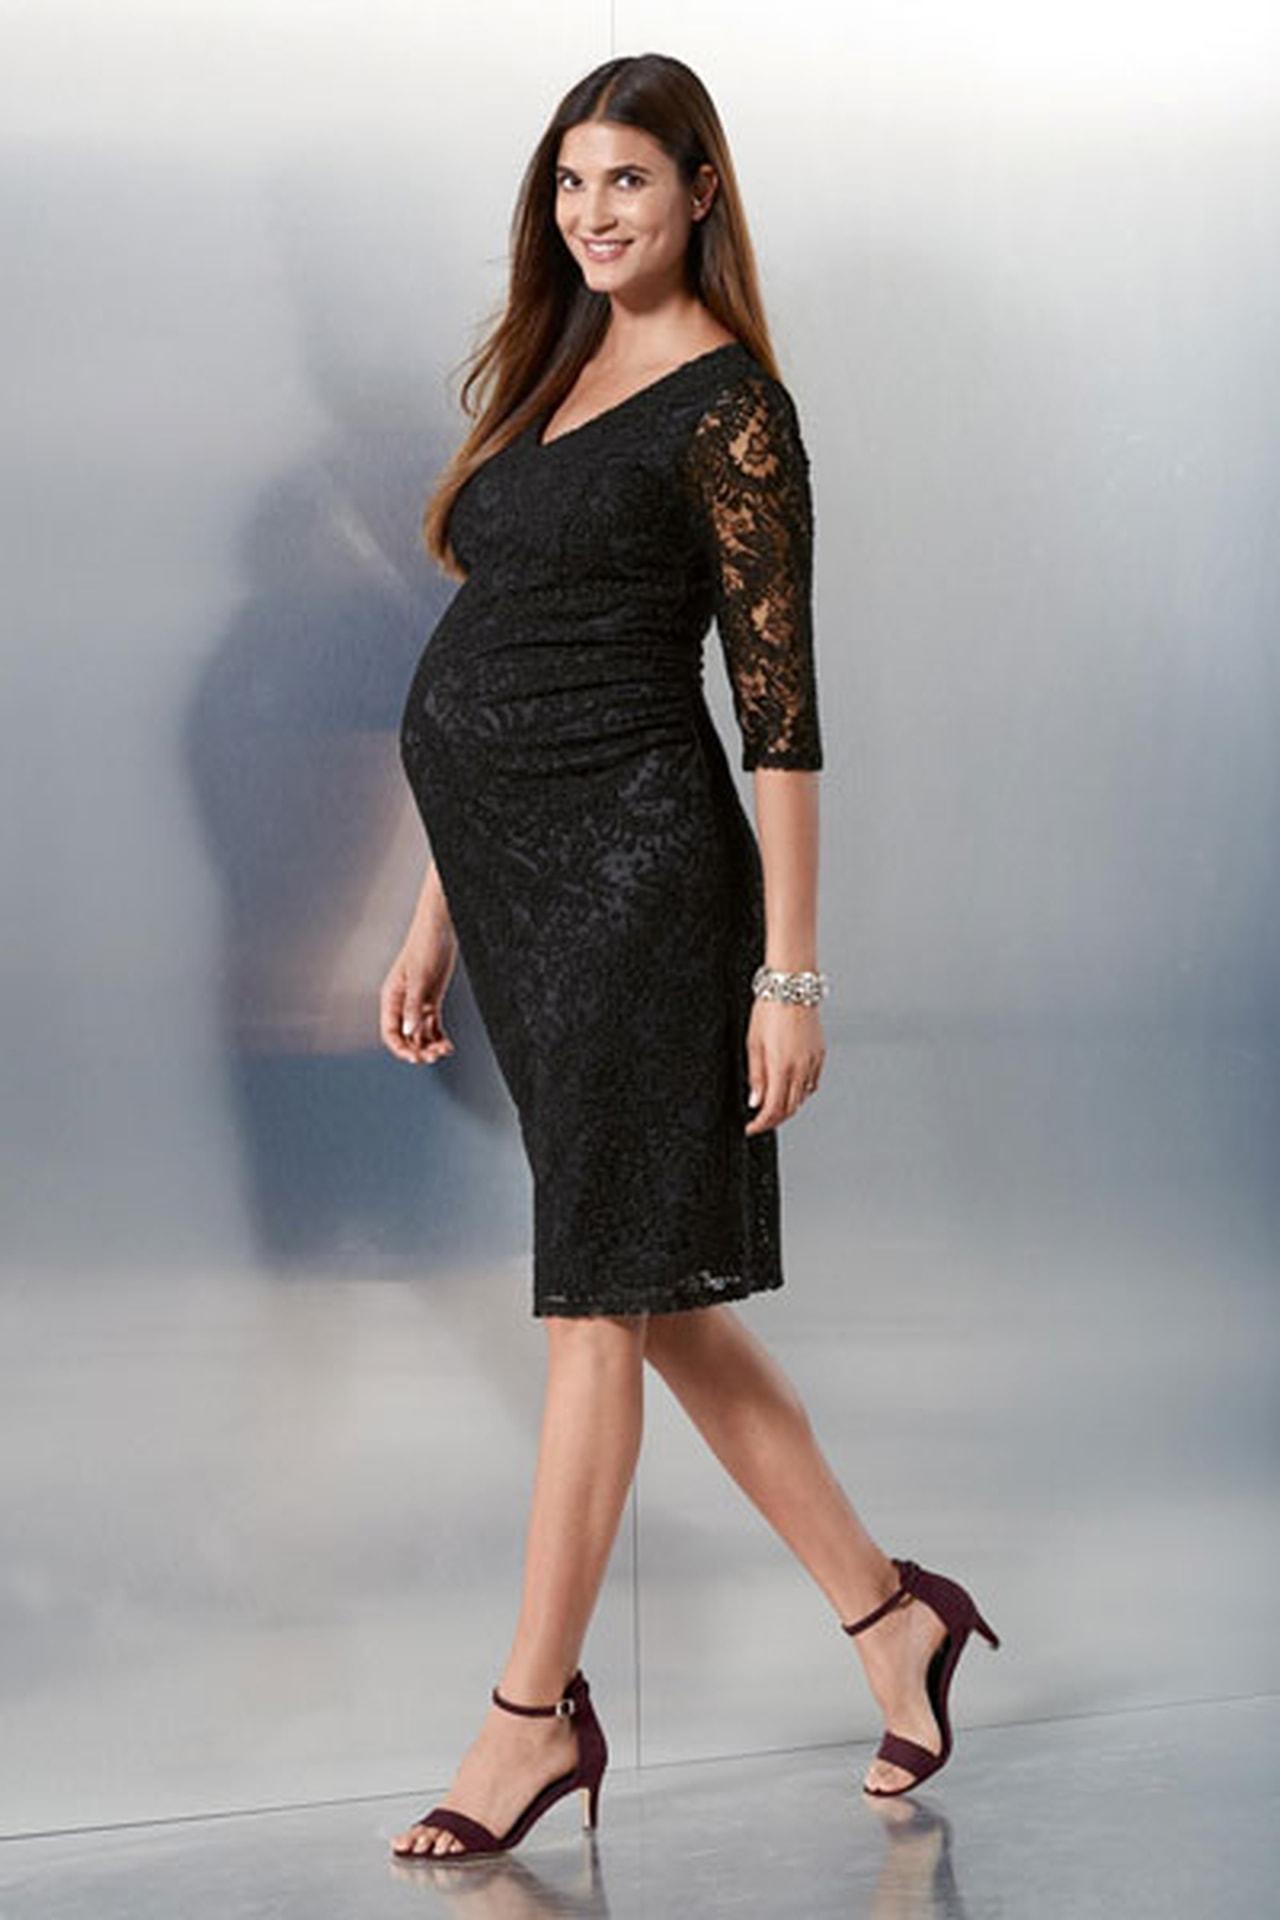 صور ملابس حوامل انيقه , اجمل لبس خروج للحامل